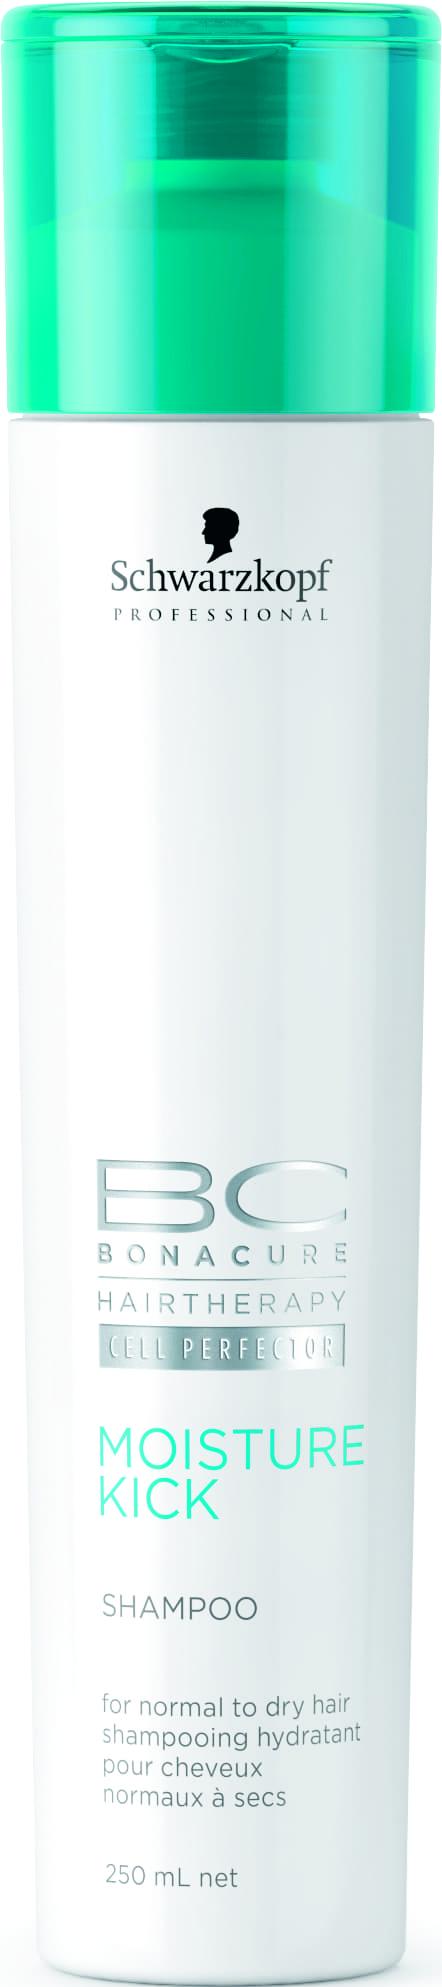 Shampoo Hidratante Bonacure Moisture Kick (250ml)| Schwarzkopf Professional